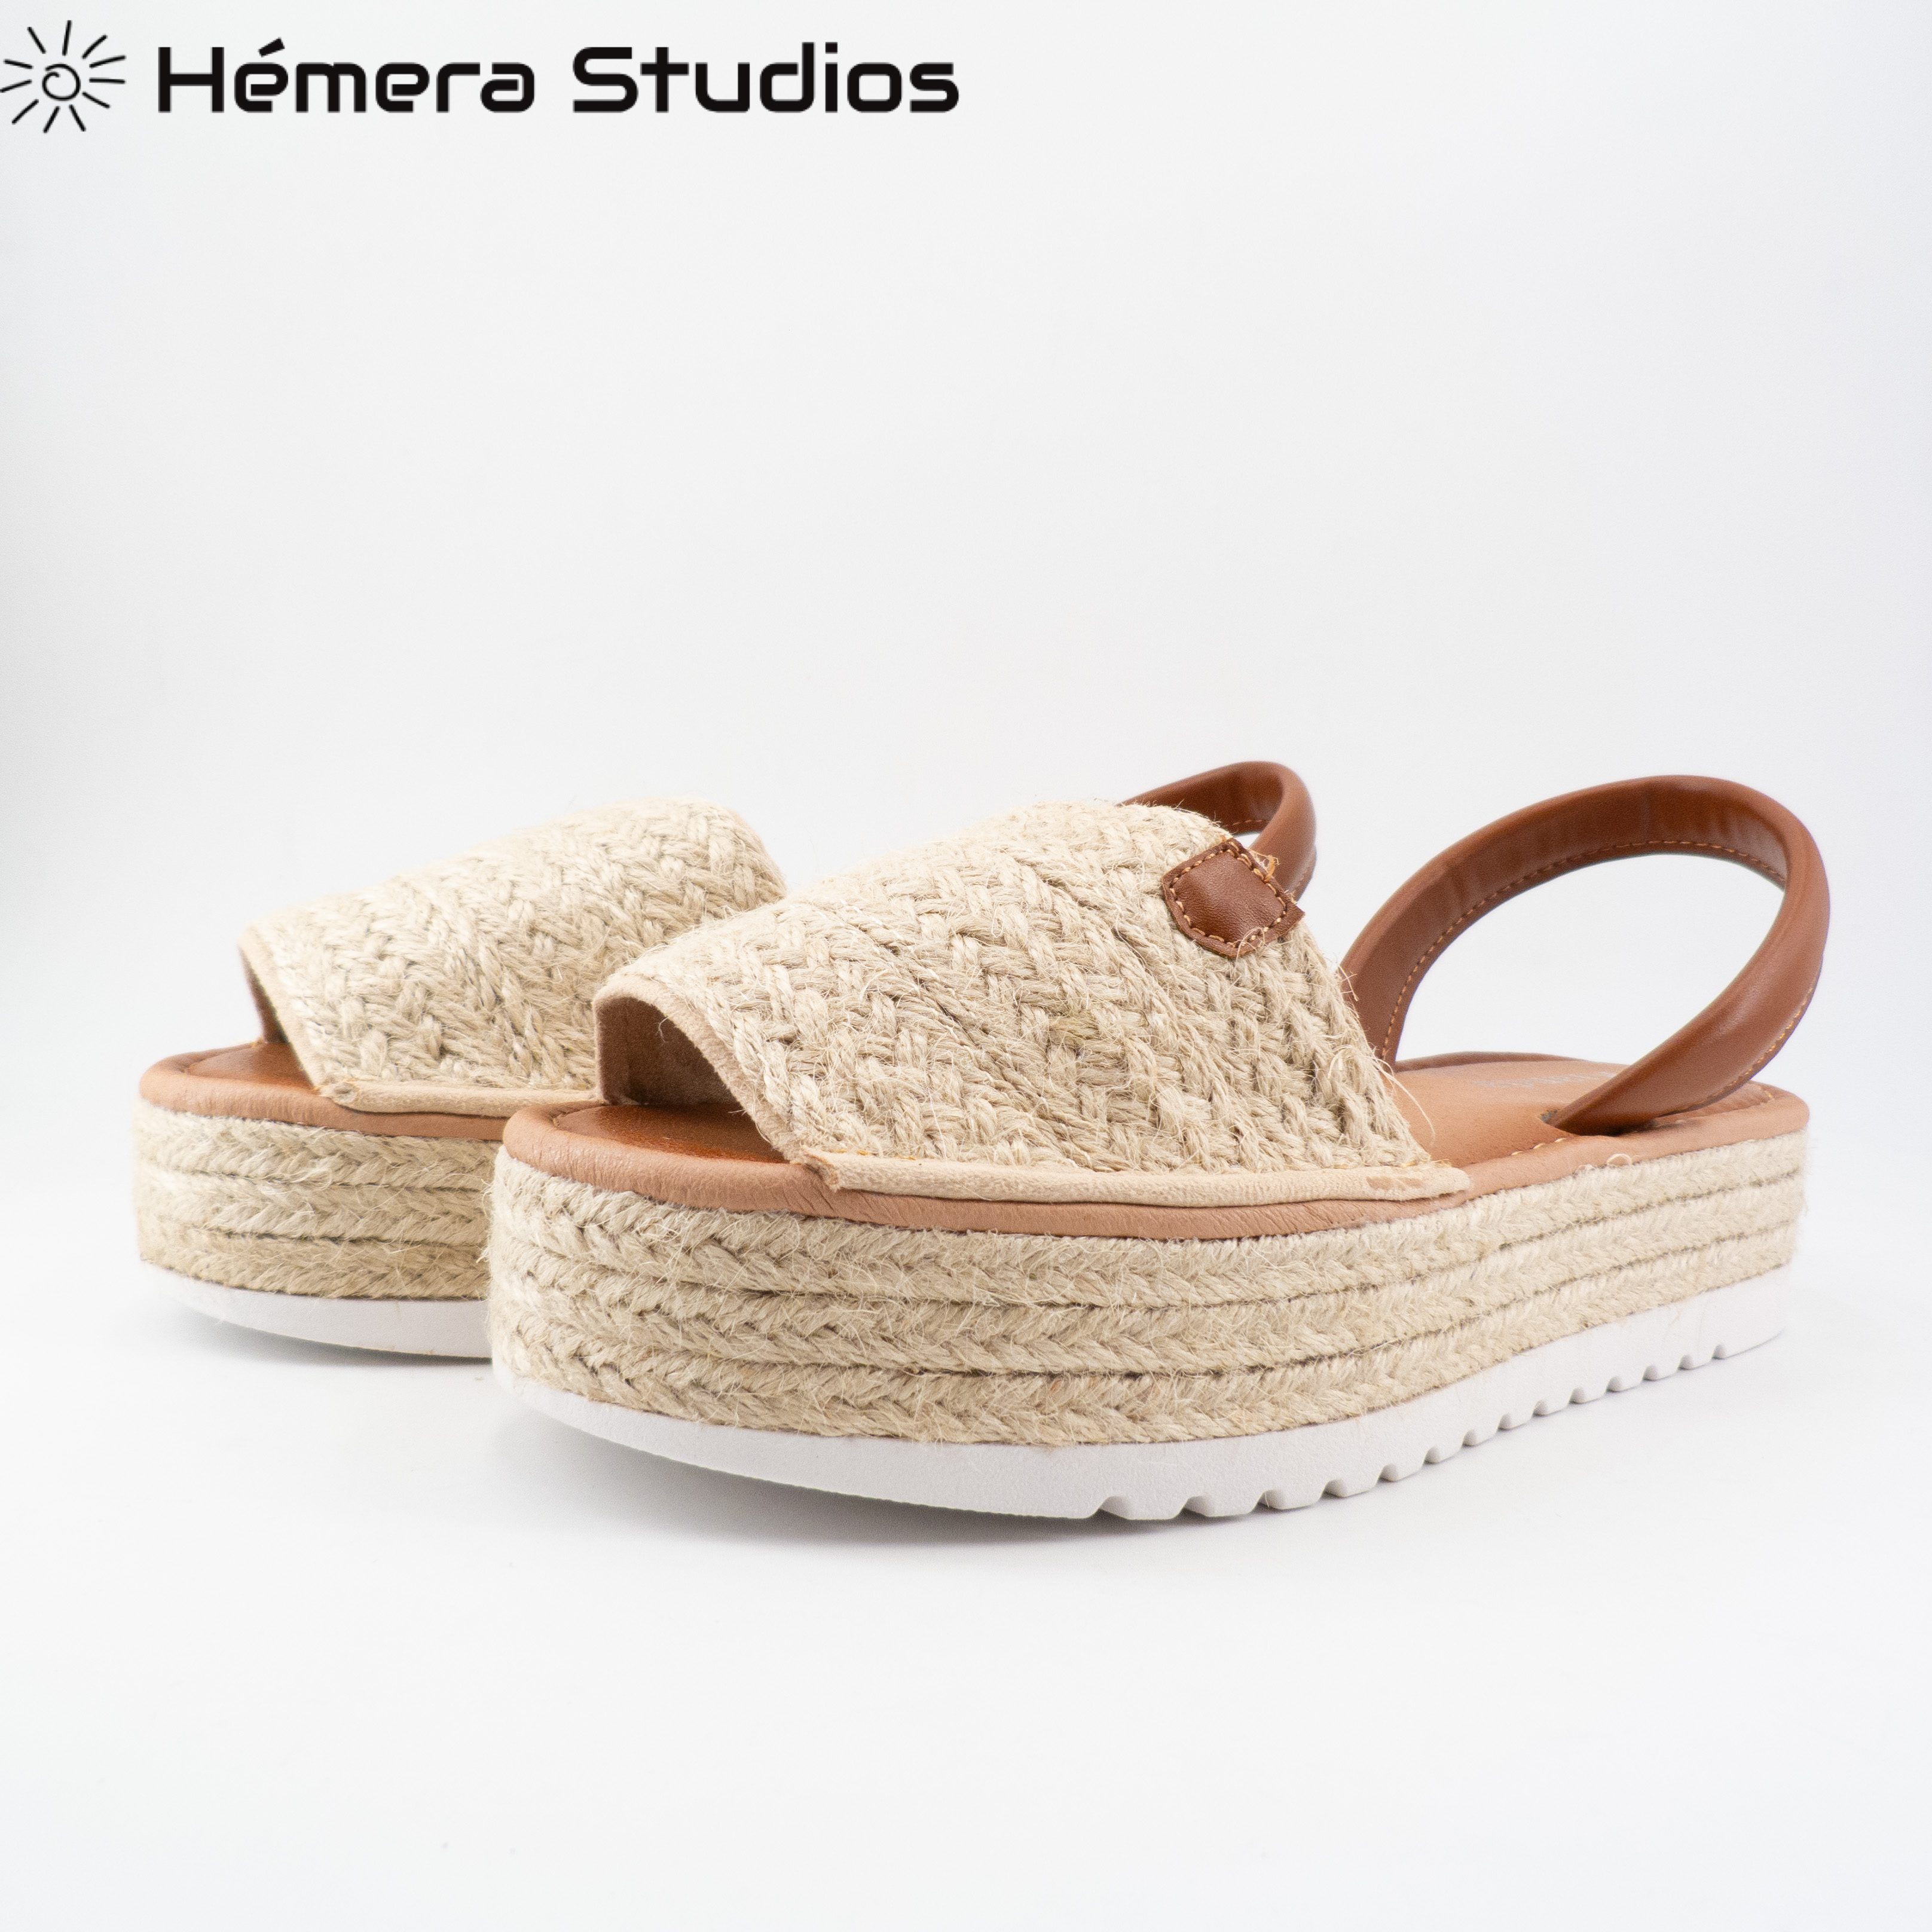 Woman Sandals 2020 Summer MENORQUINA ESPARTOS Buckle Platform Espadrille Wedge Beach Open Animal Print Multicolor